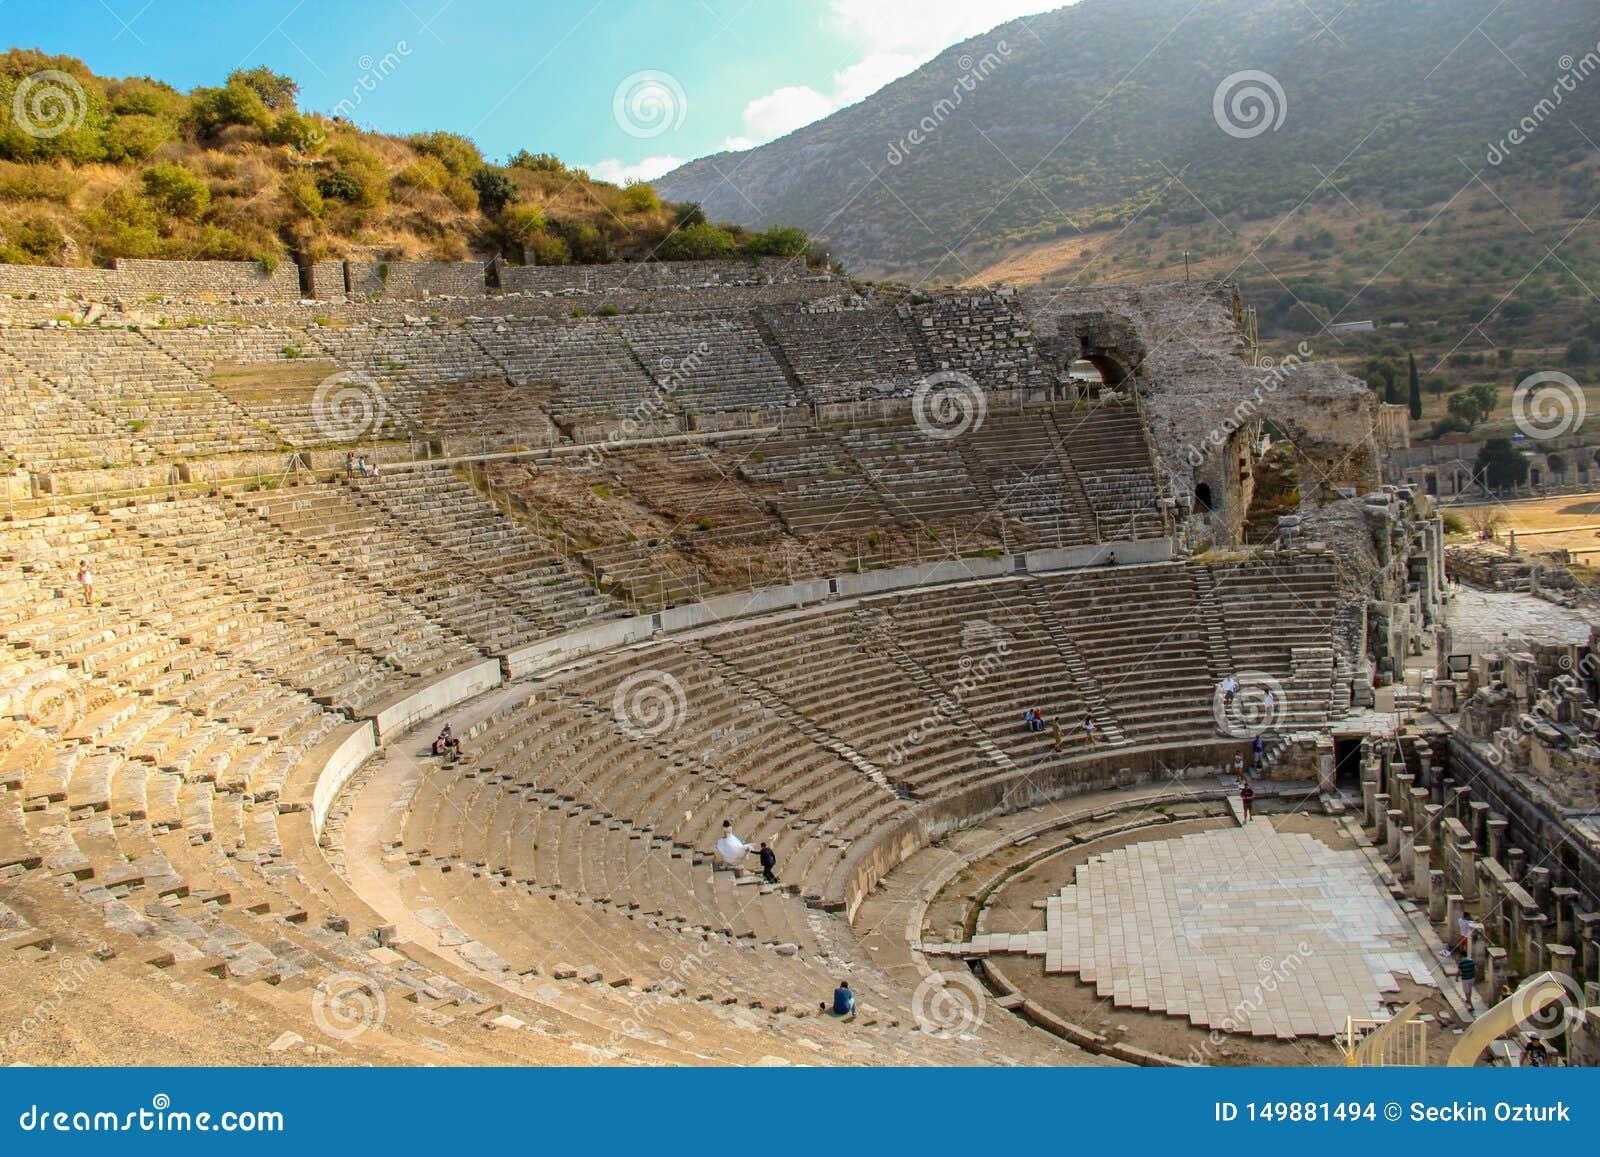 Wedding shooting in greek amphitheater Ephesus